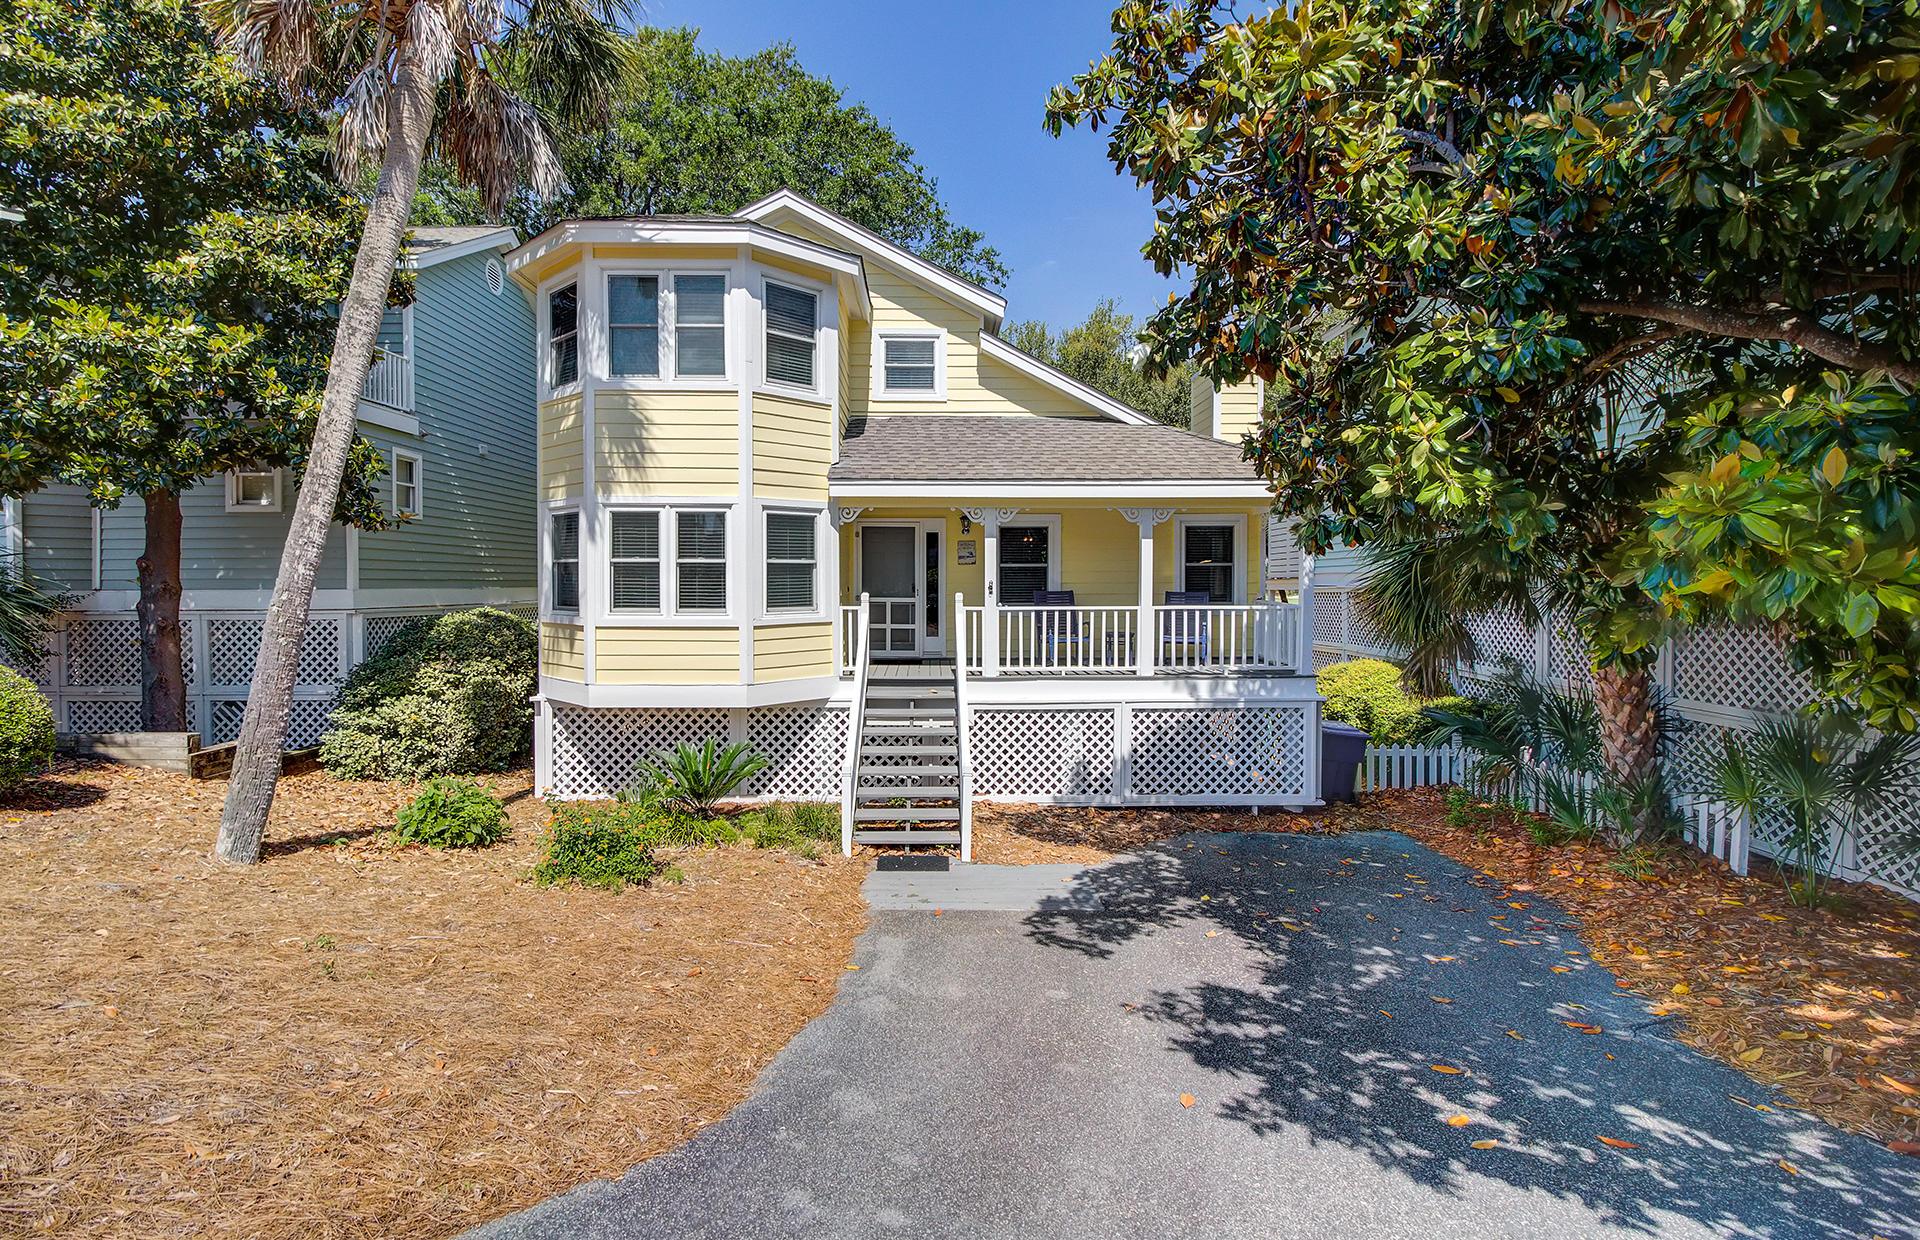 25 Pelican Reach, Isle of Palms, 29451, 3 Bedrooms Bedrooms, ,2 BathroomsBathrooms,Residential,For Sale,Pelican Reach,21017803